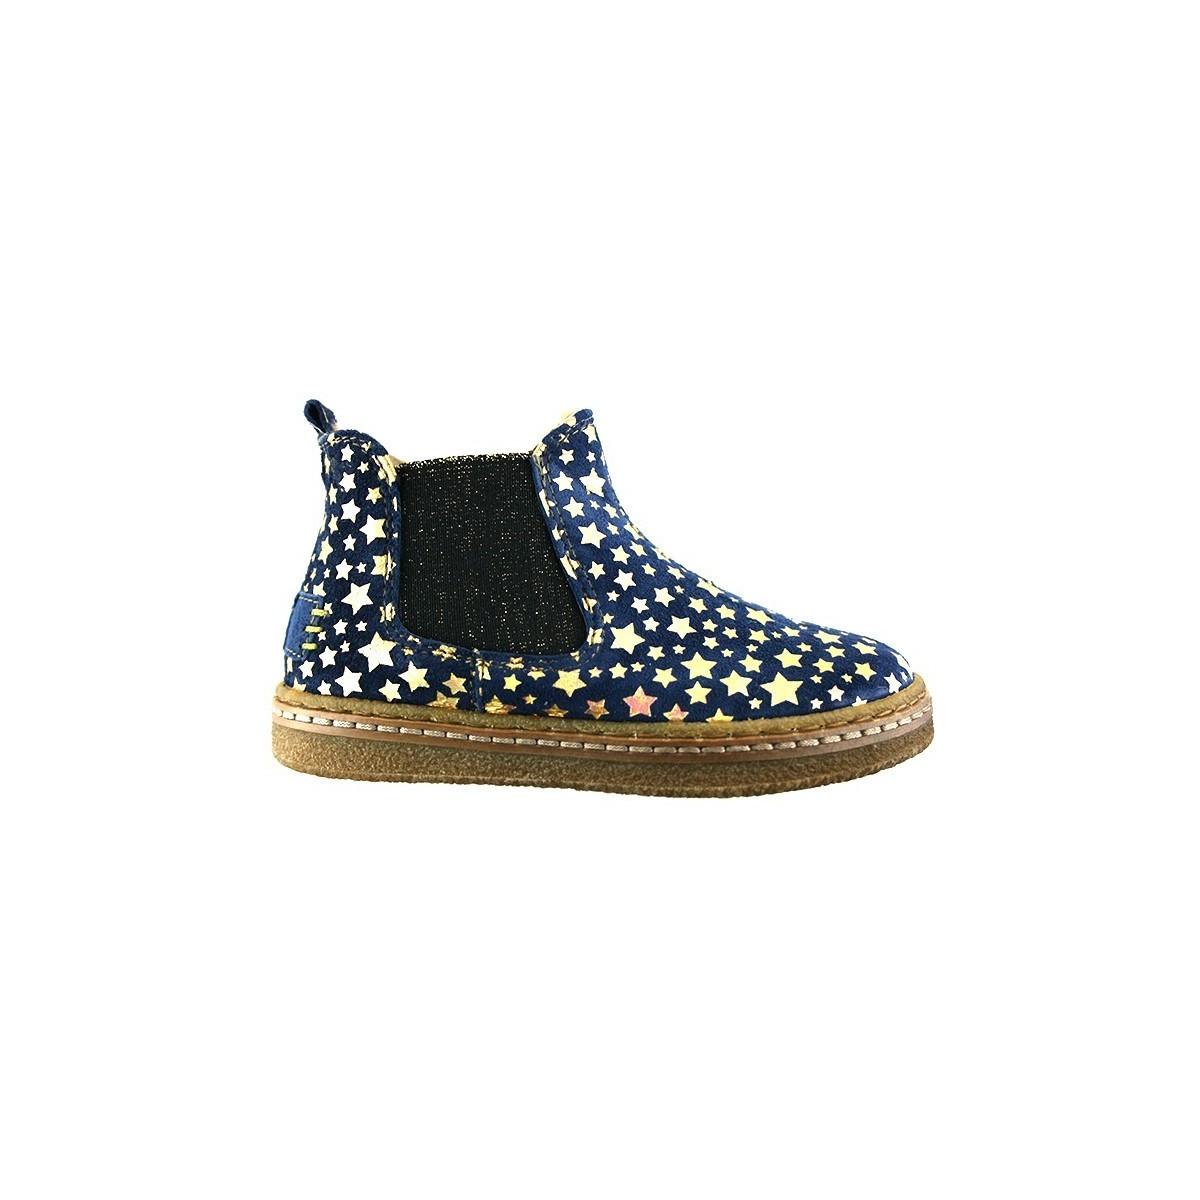 Boots cuir bleu étoile